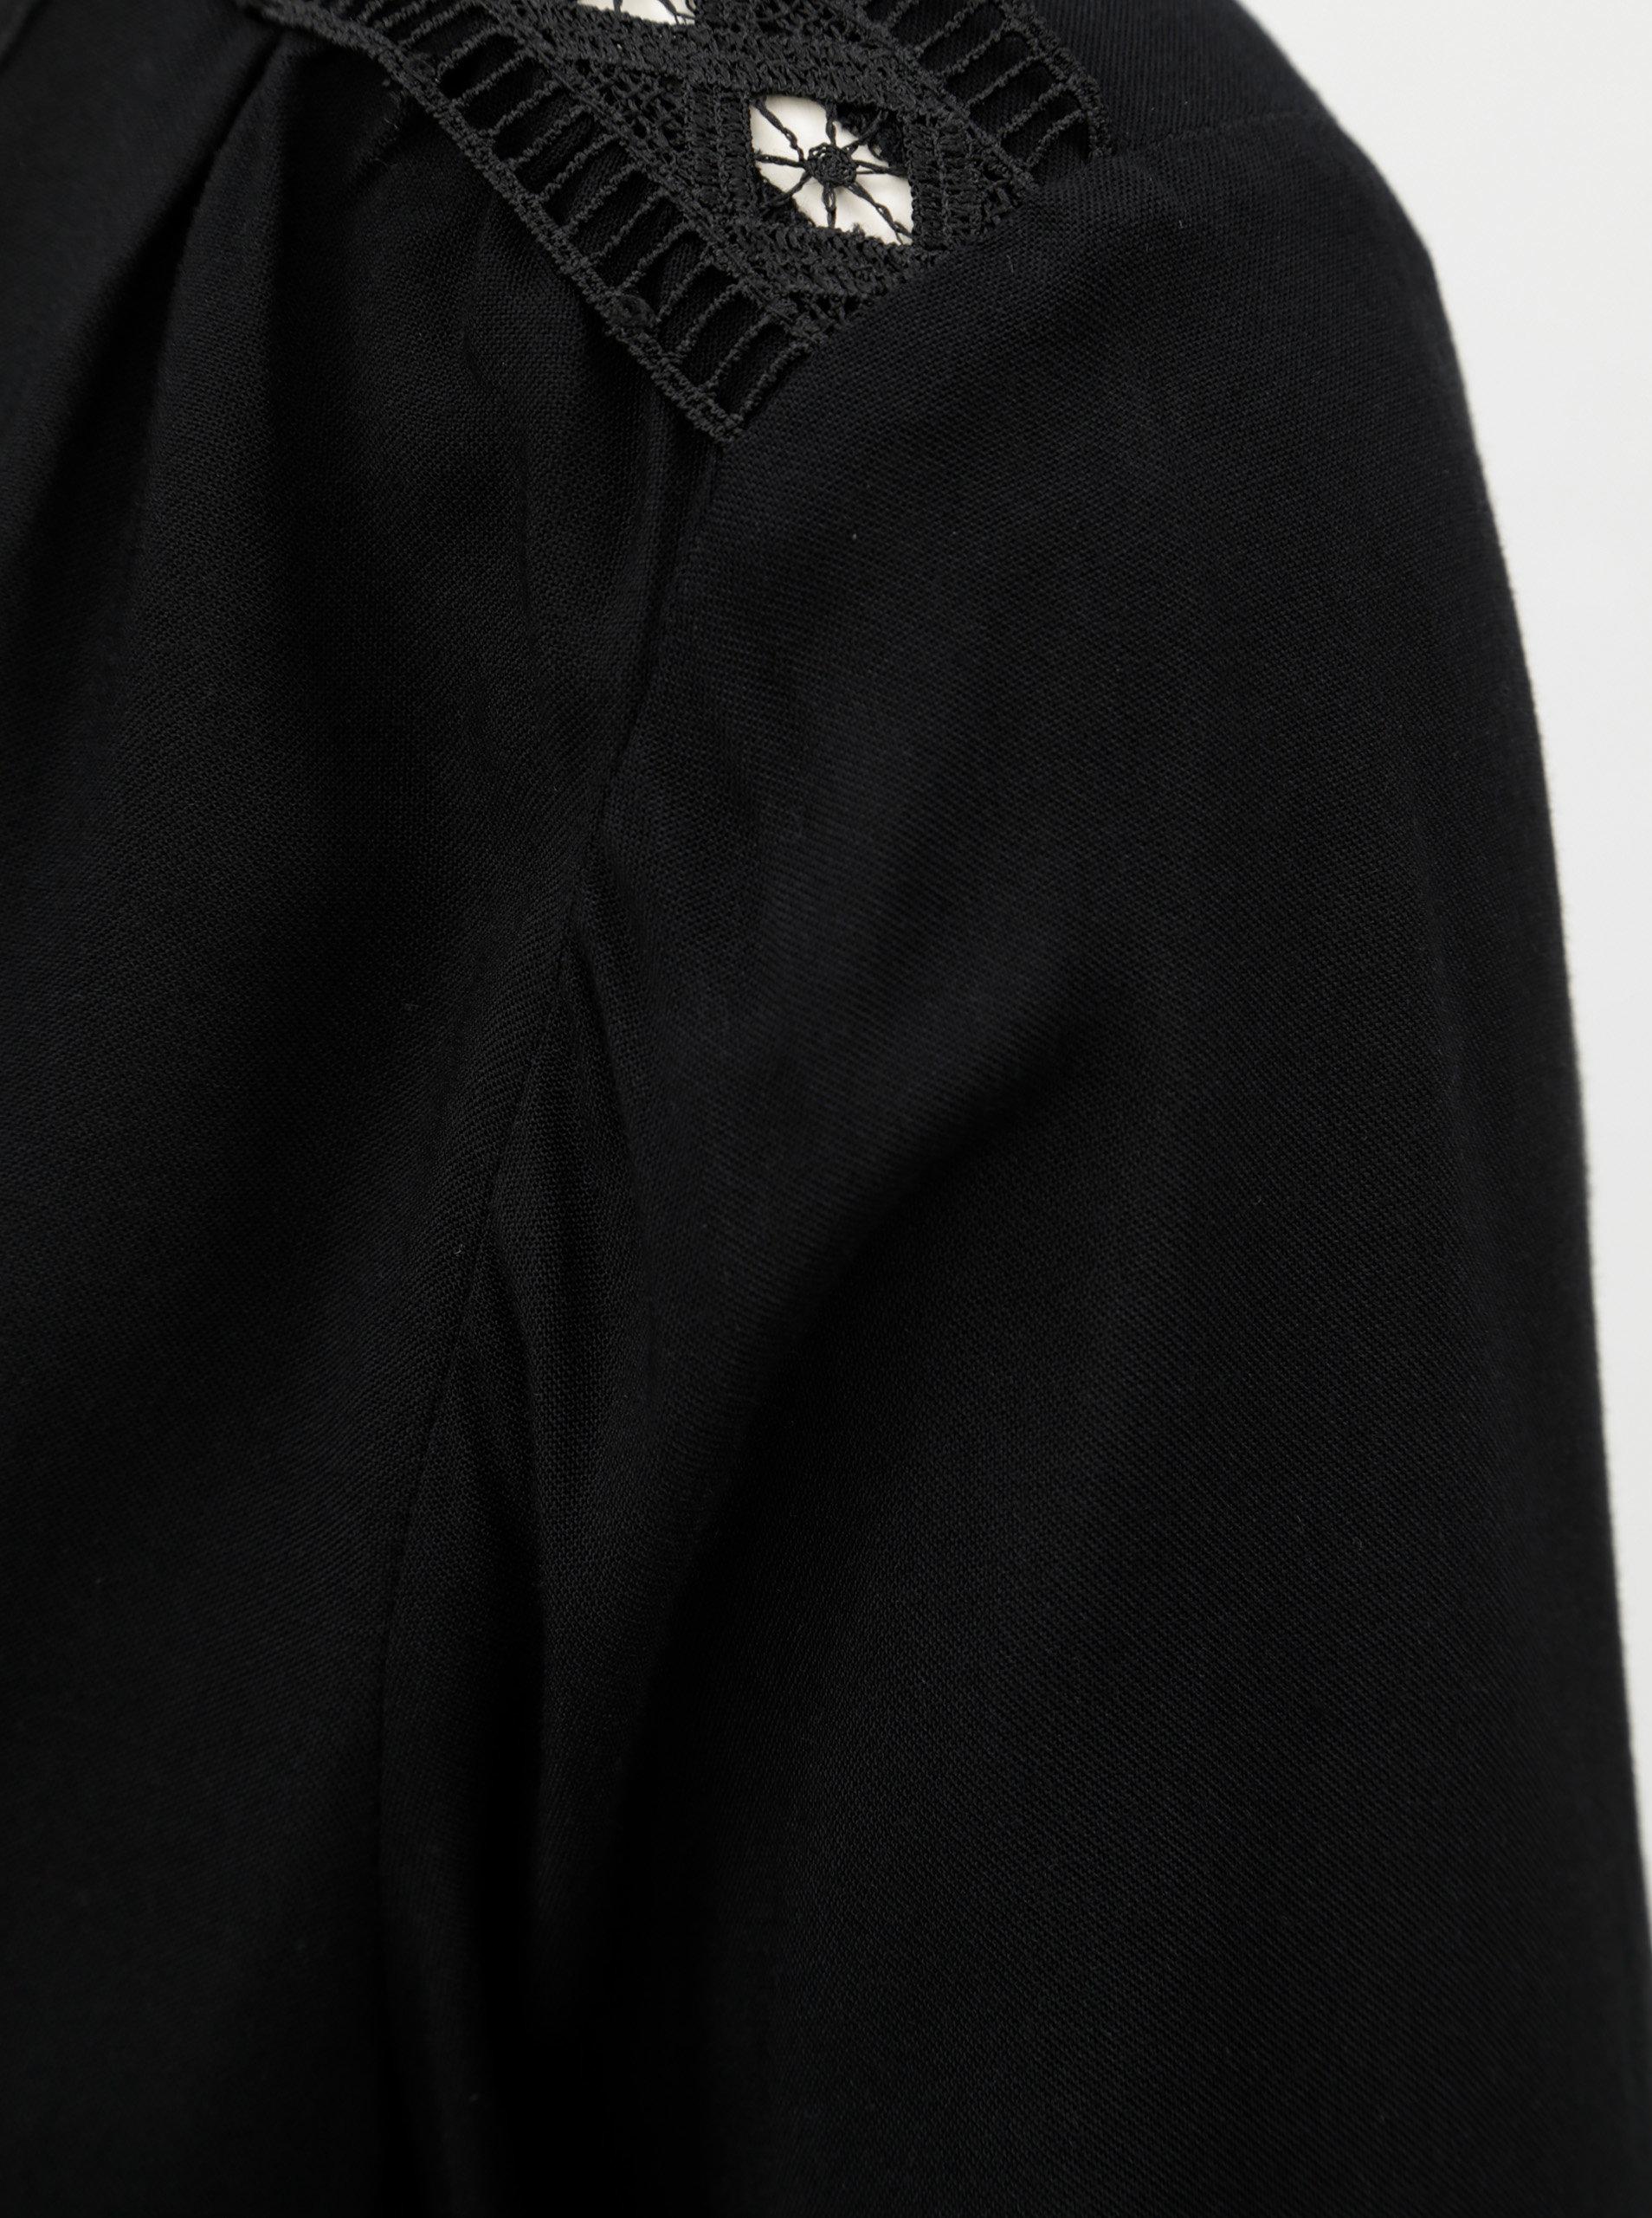 Čierna blúzka s čipkovanými detailmi VERO MODA Susan ... 175ac2dcd90